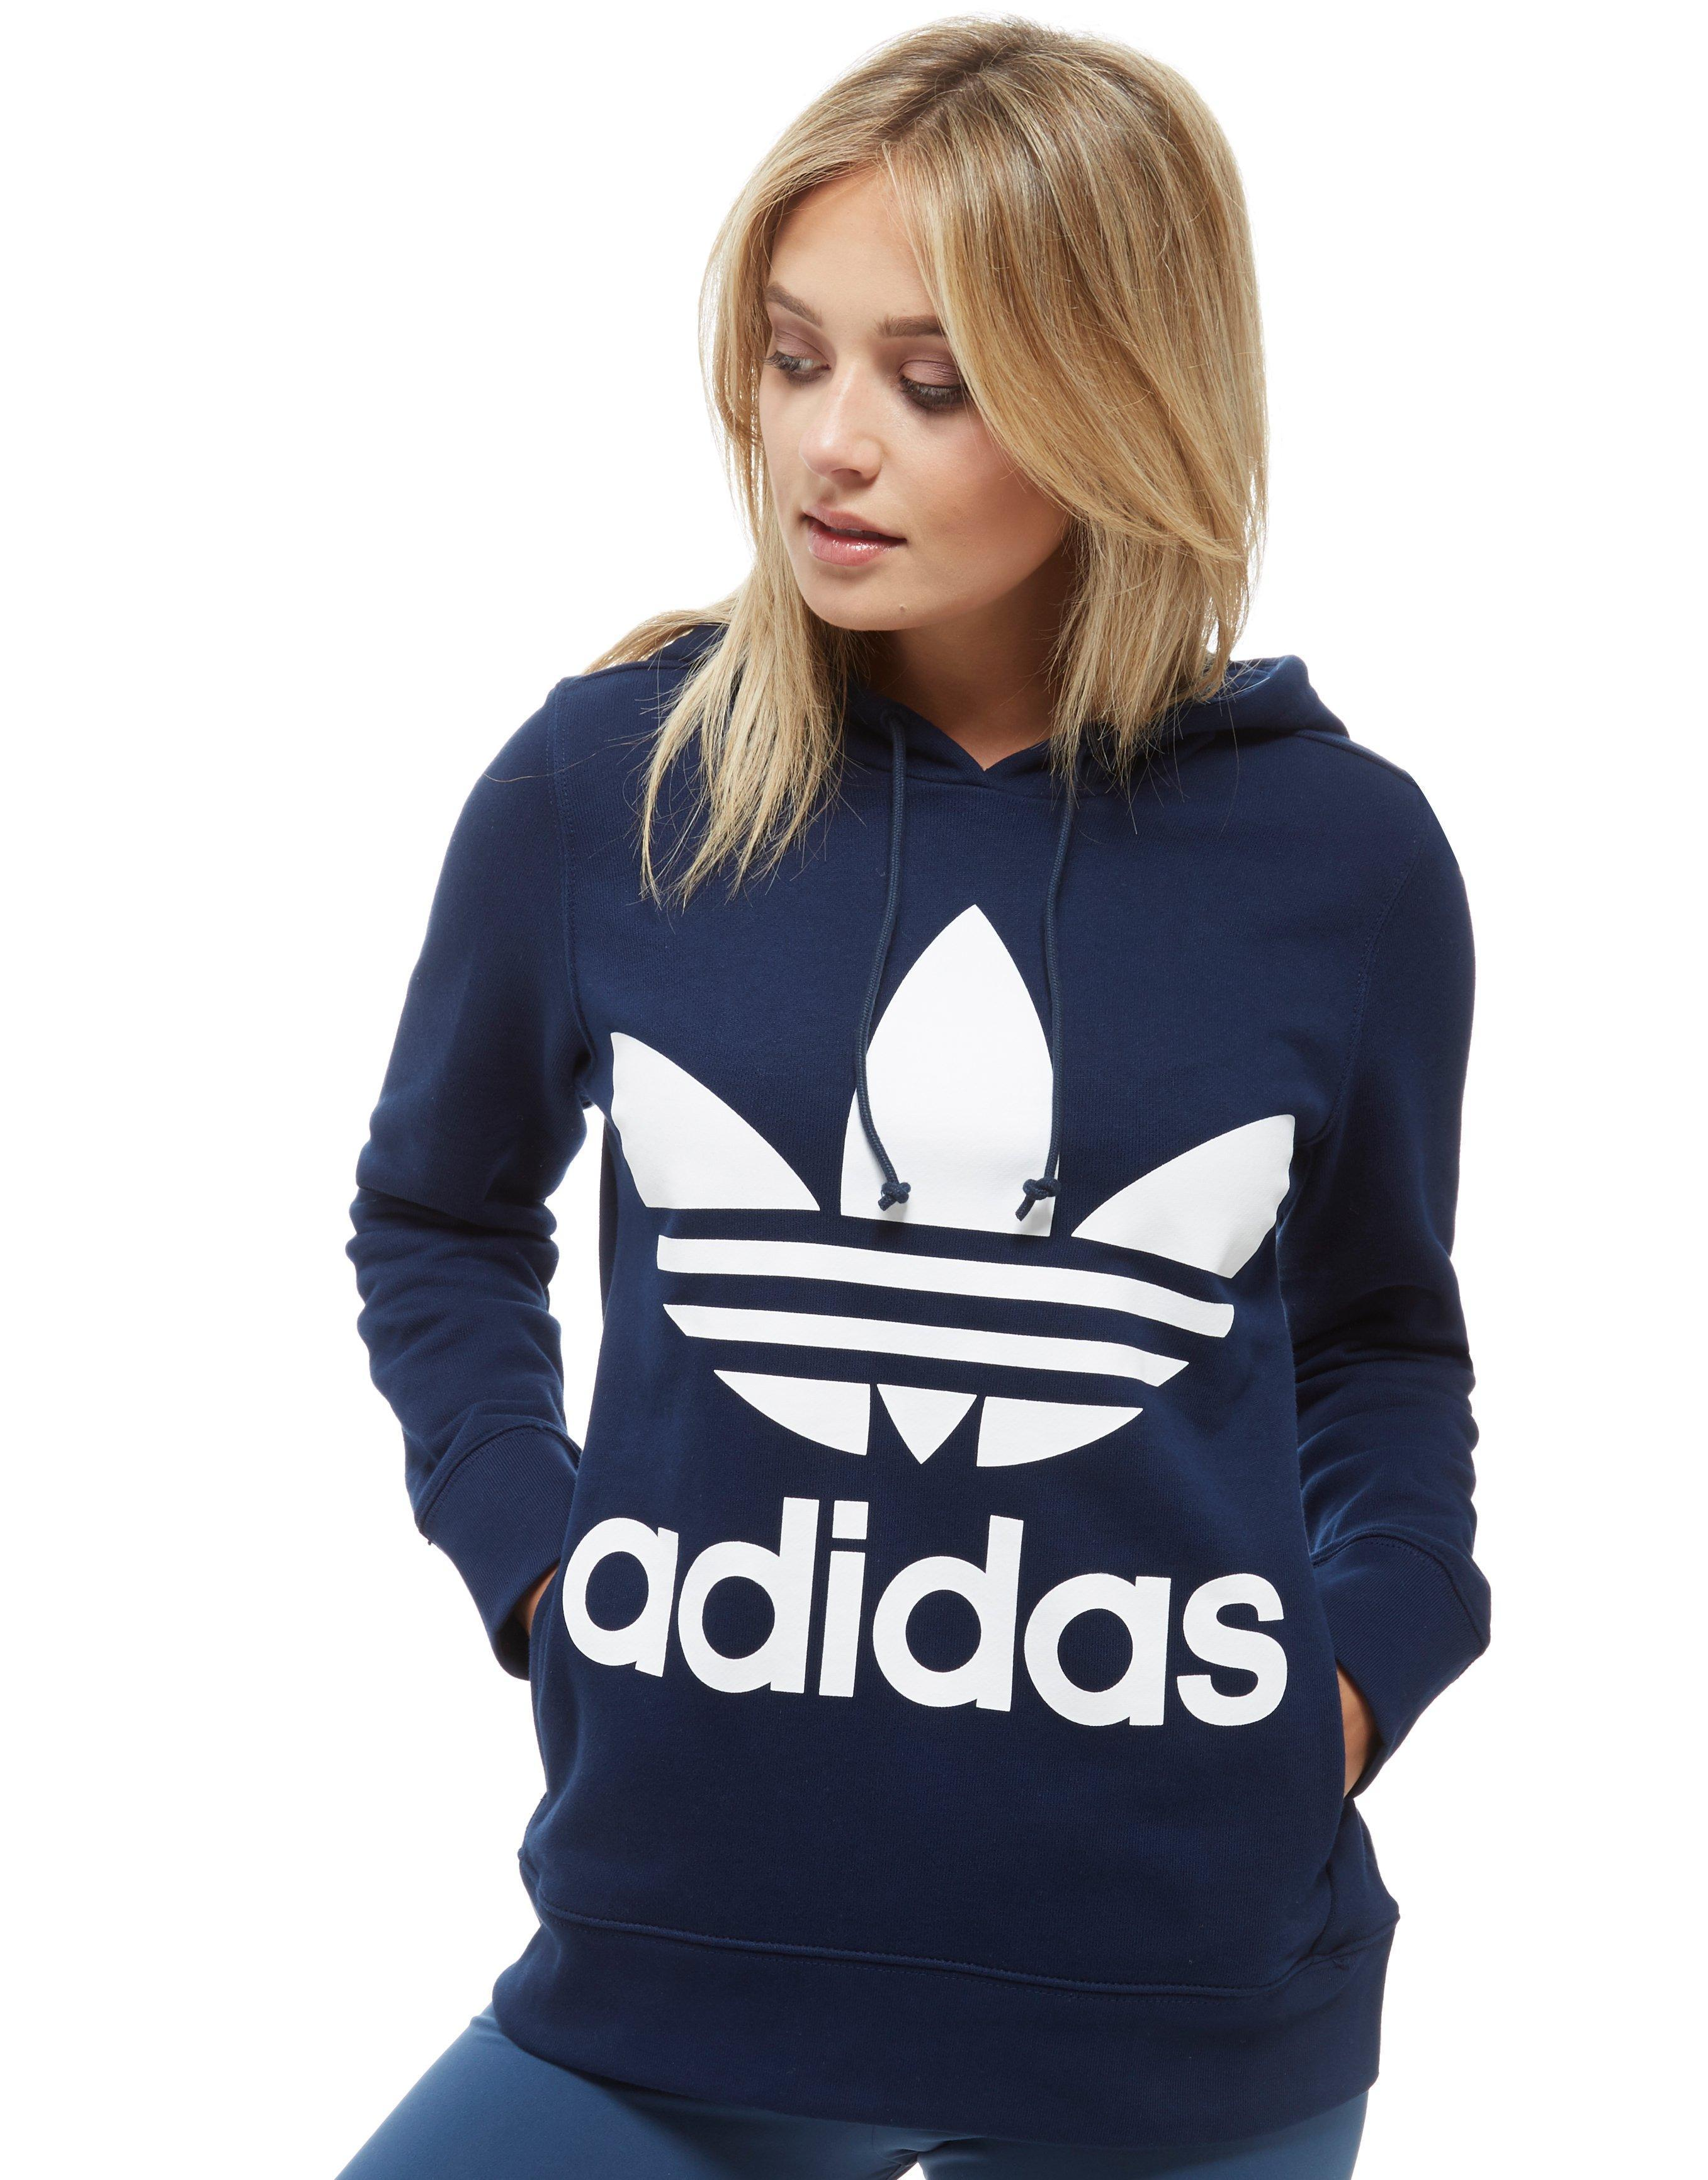 Lyst en Trefoil Adidas Originals Trefoil Overhead Hoodie Lyst en azul 41b888f - itorrent.site